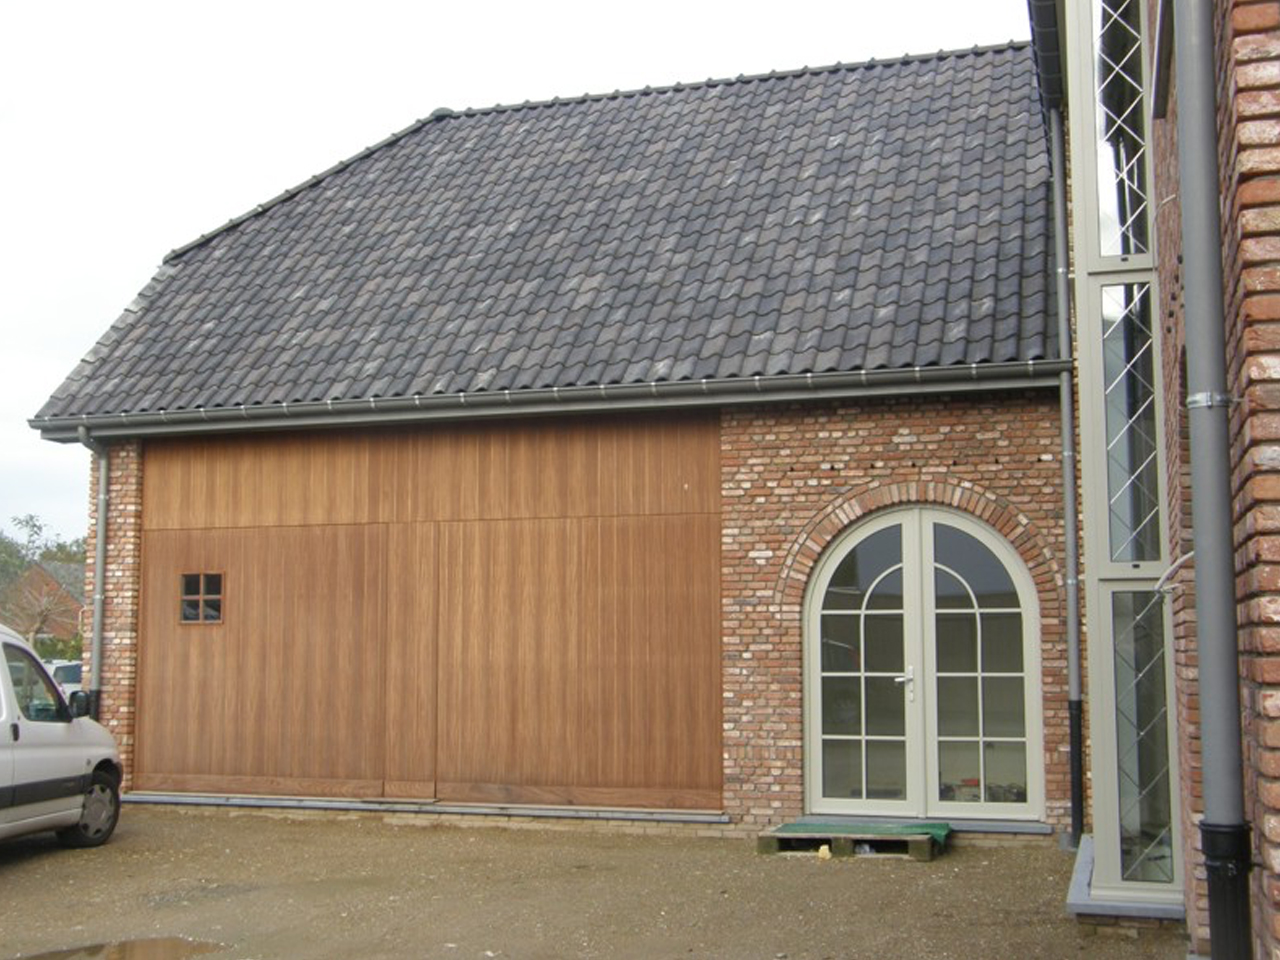 Nieuwbouw landelijke woning